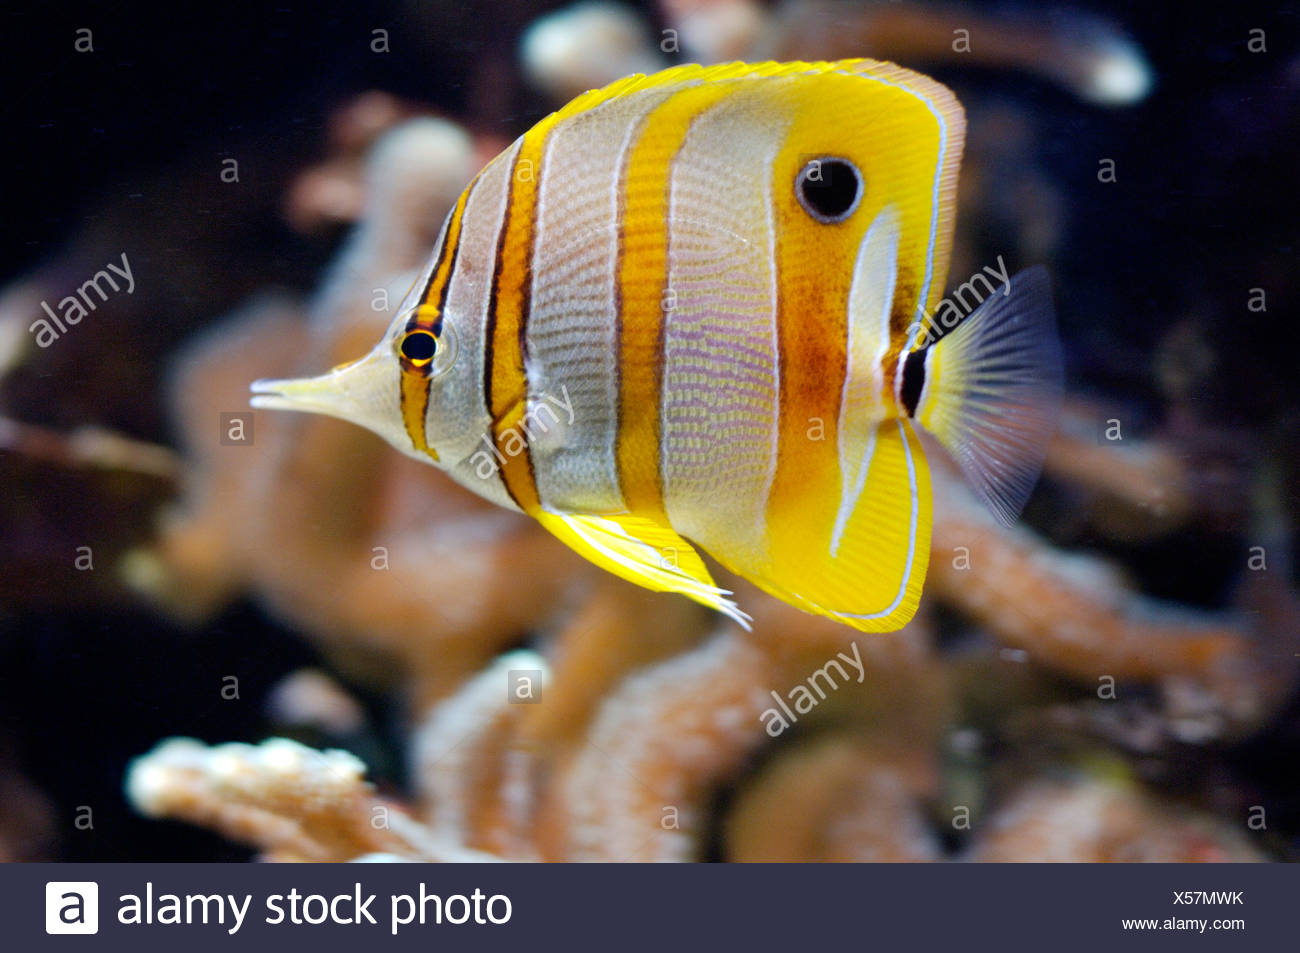 Beaked coralfish Chelmon rostratus Indopacific South Chinese Sea Malaysia, aquarium Berlin Germany - Stock Image